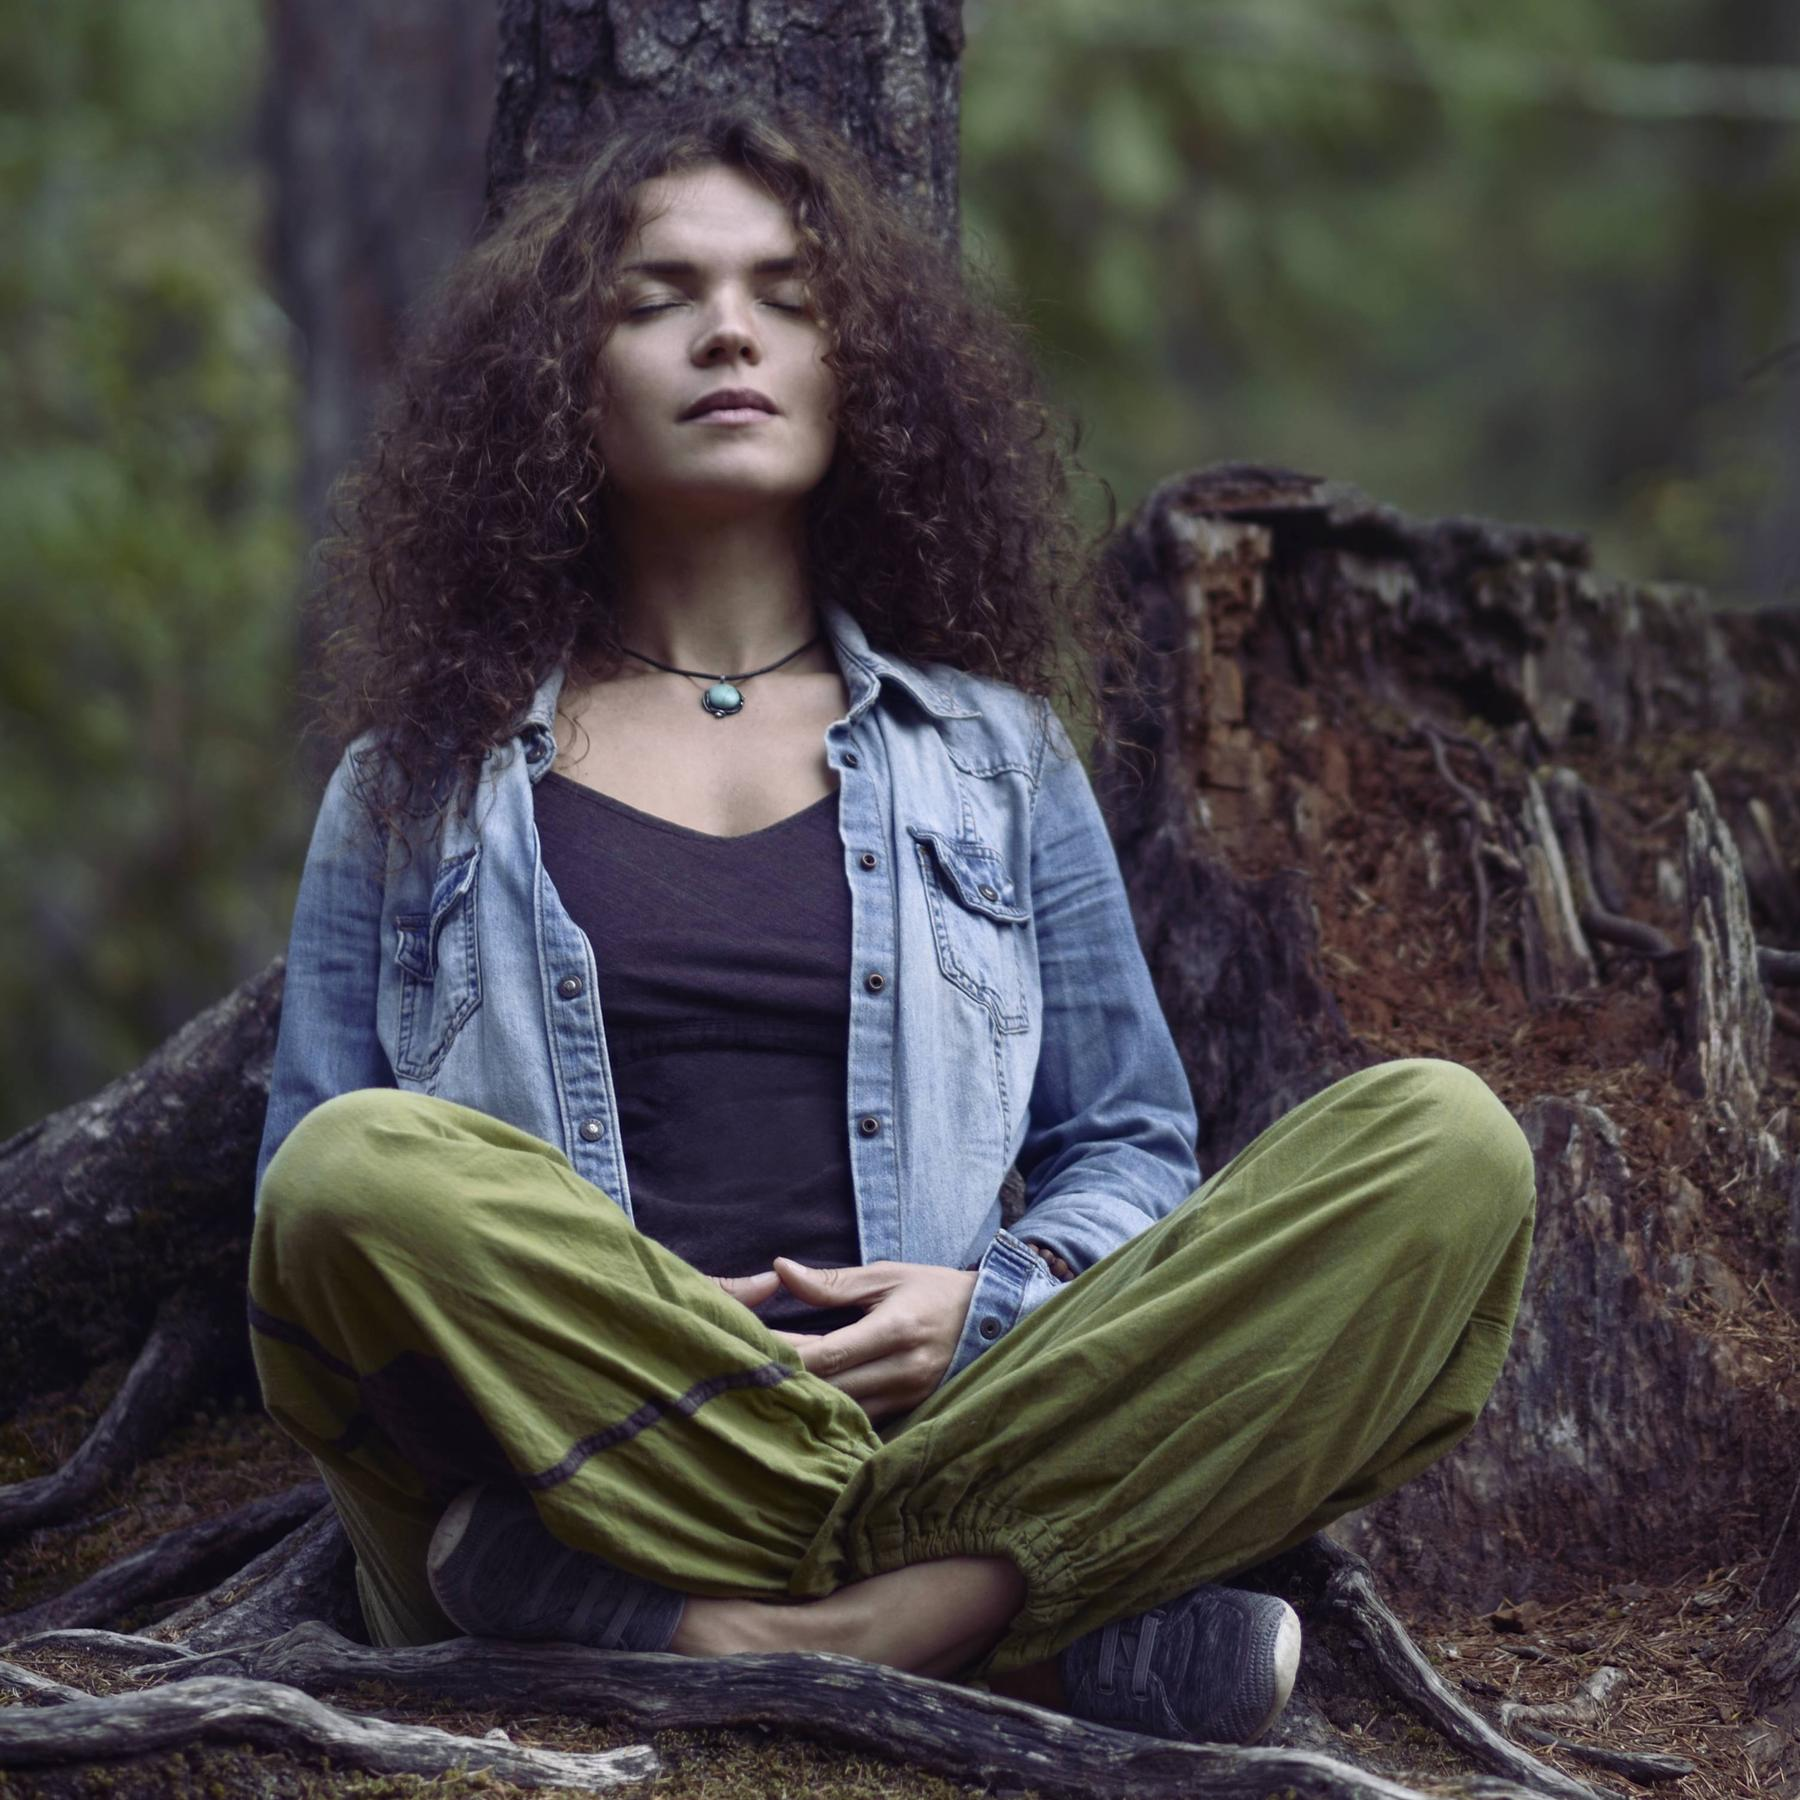 Meditation - Übung mit tiefem Sinn